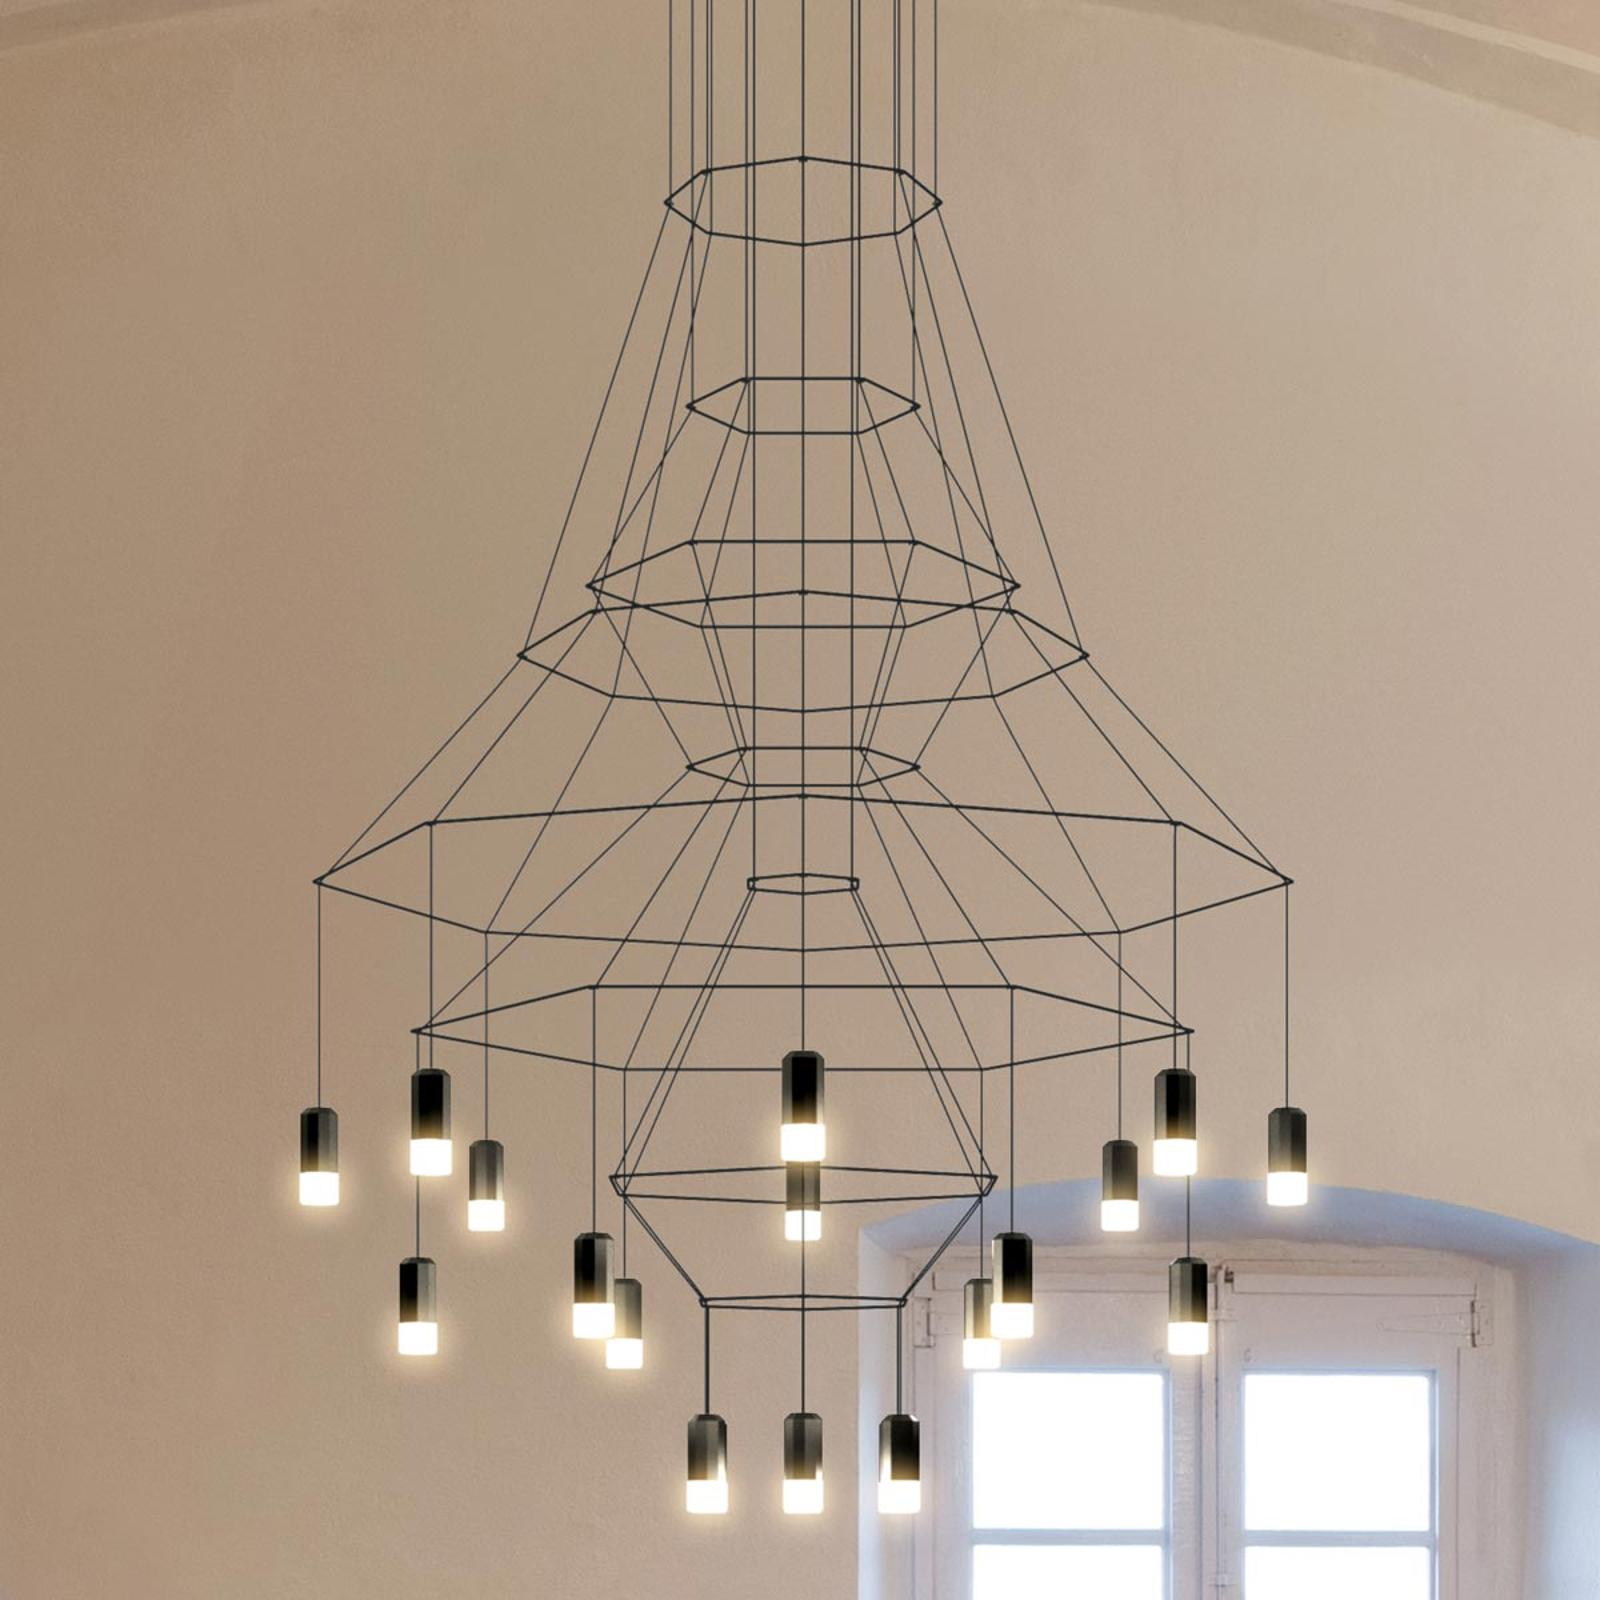 Vibia LED závesná lampa Vibia Wireflow, čierna, 279 cm